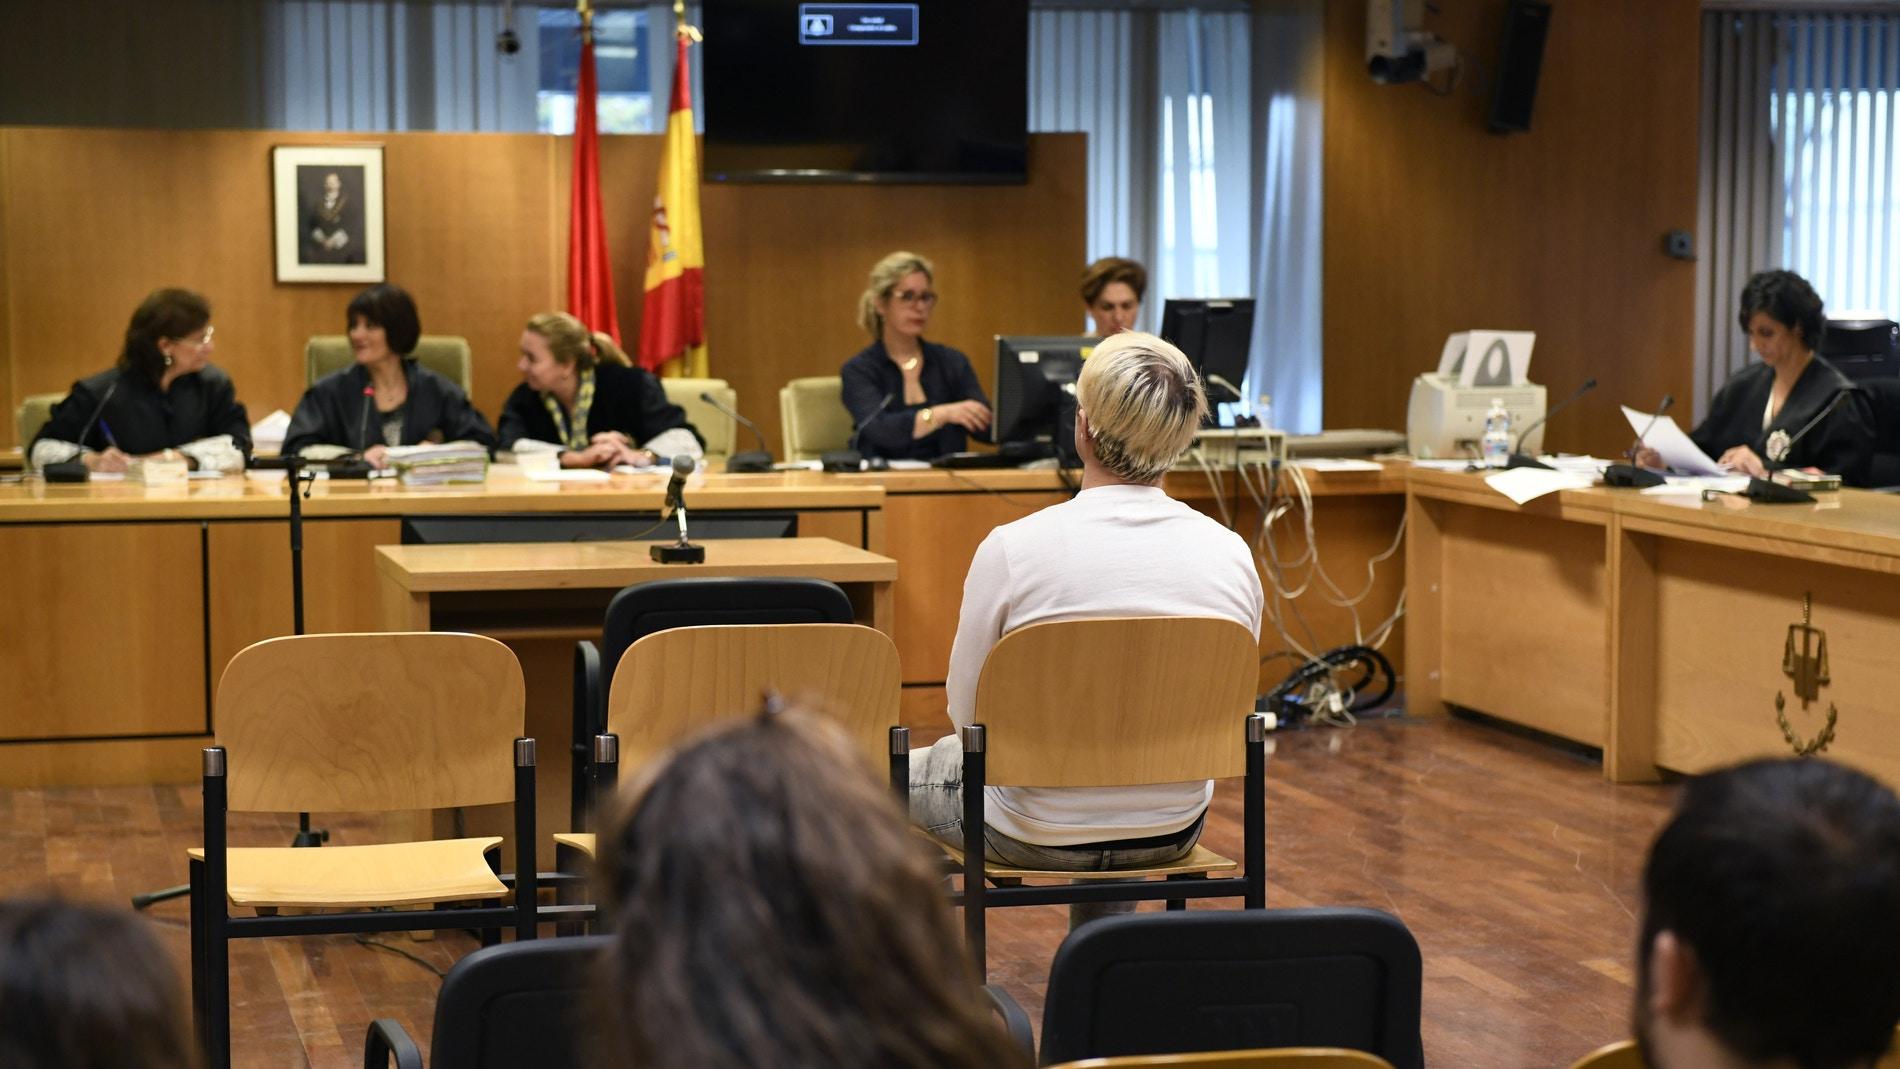 La Audiencia Provincial de Madrid juzga a Daniel José Santomé Lemus, alias 'Dalas Review